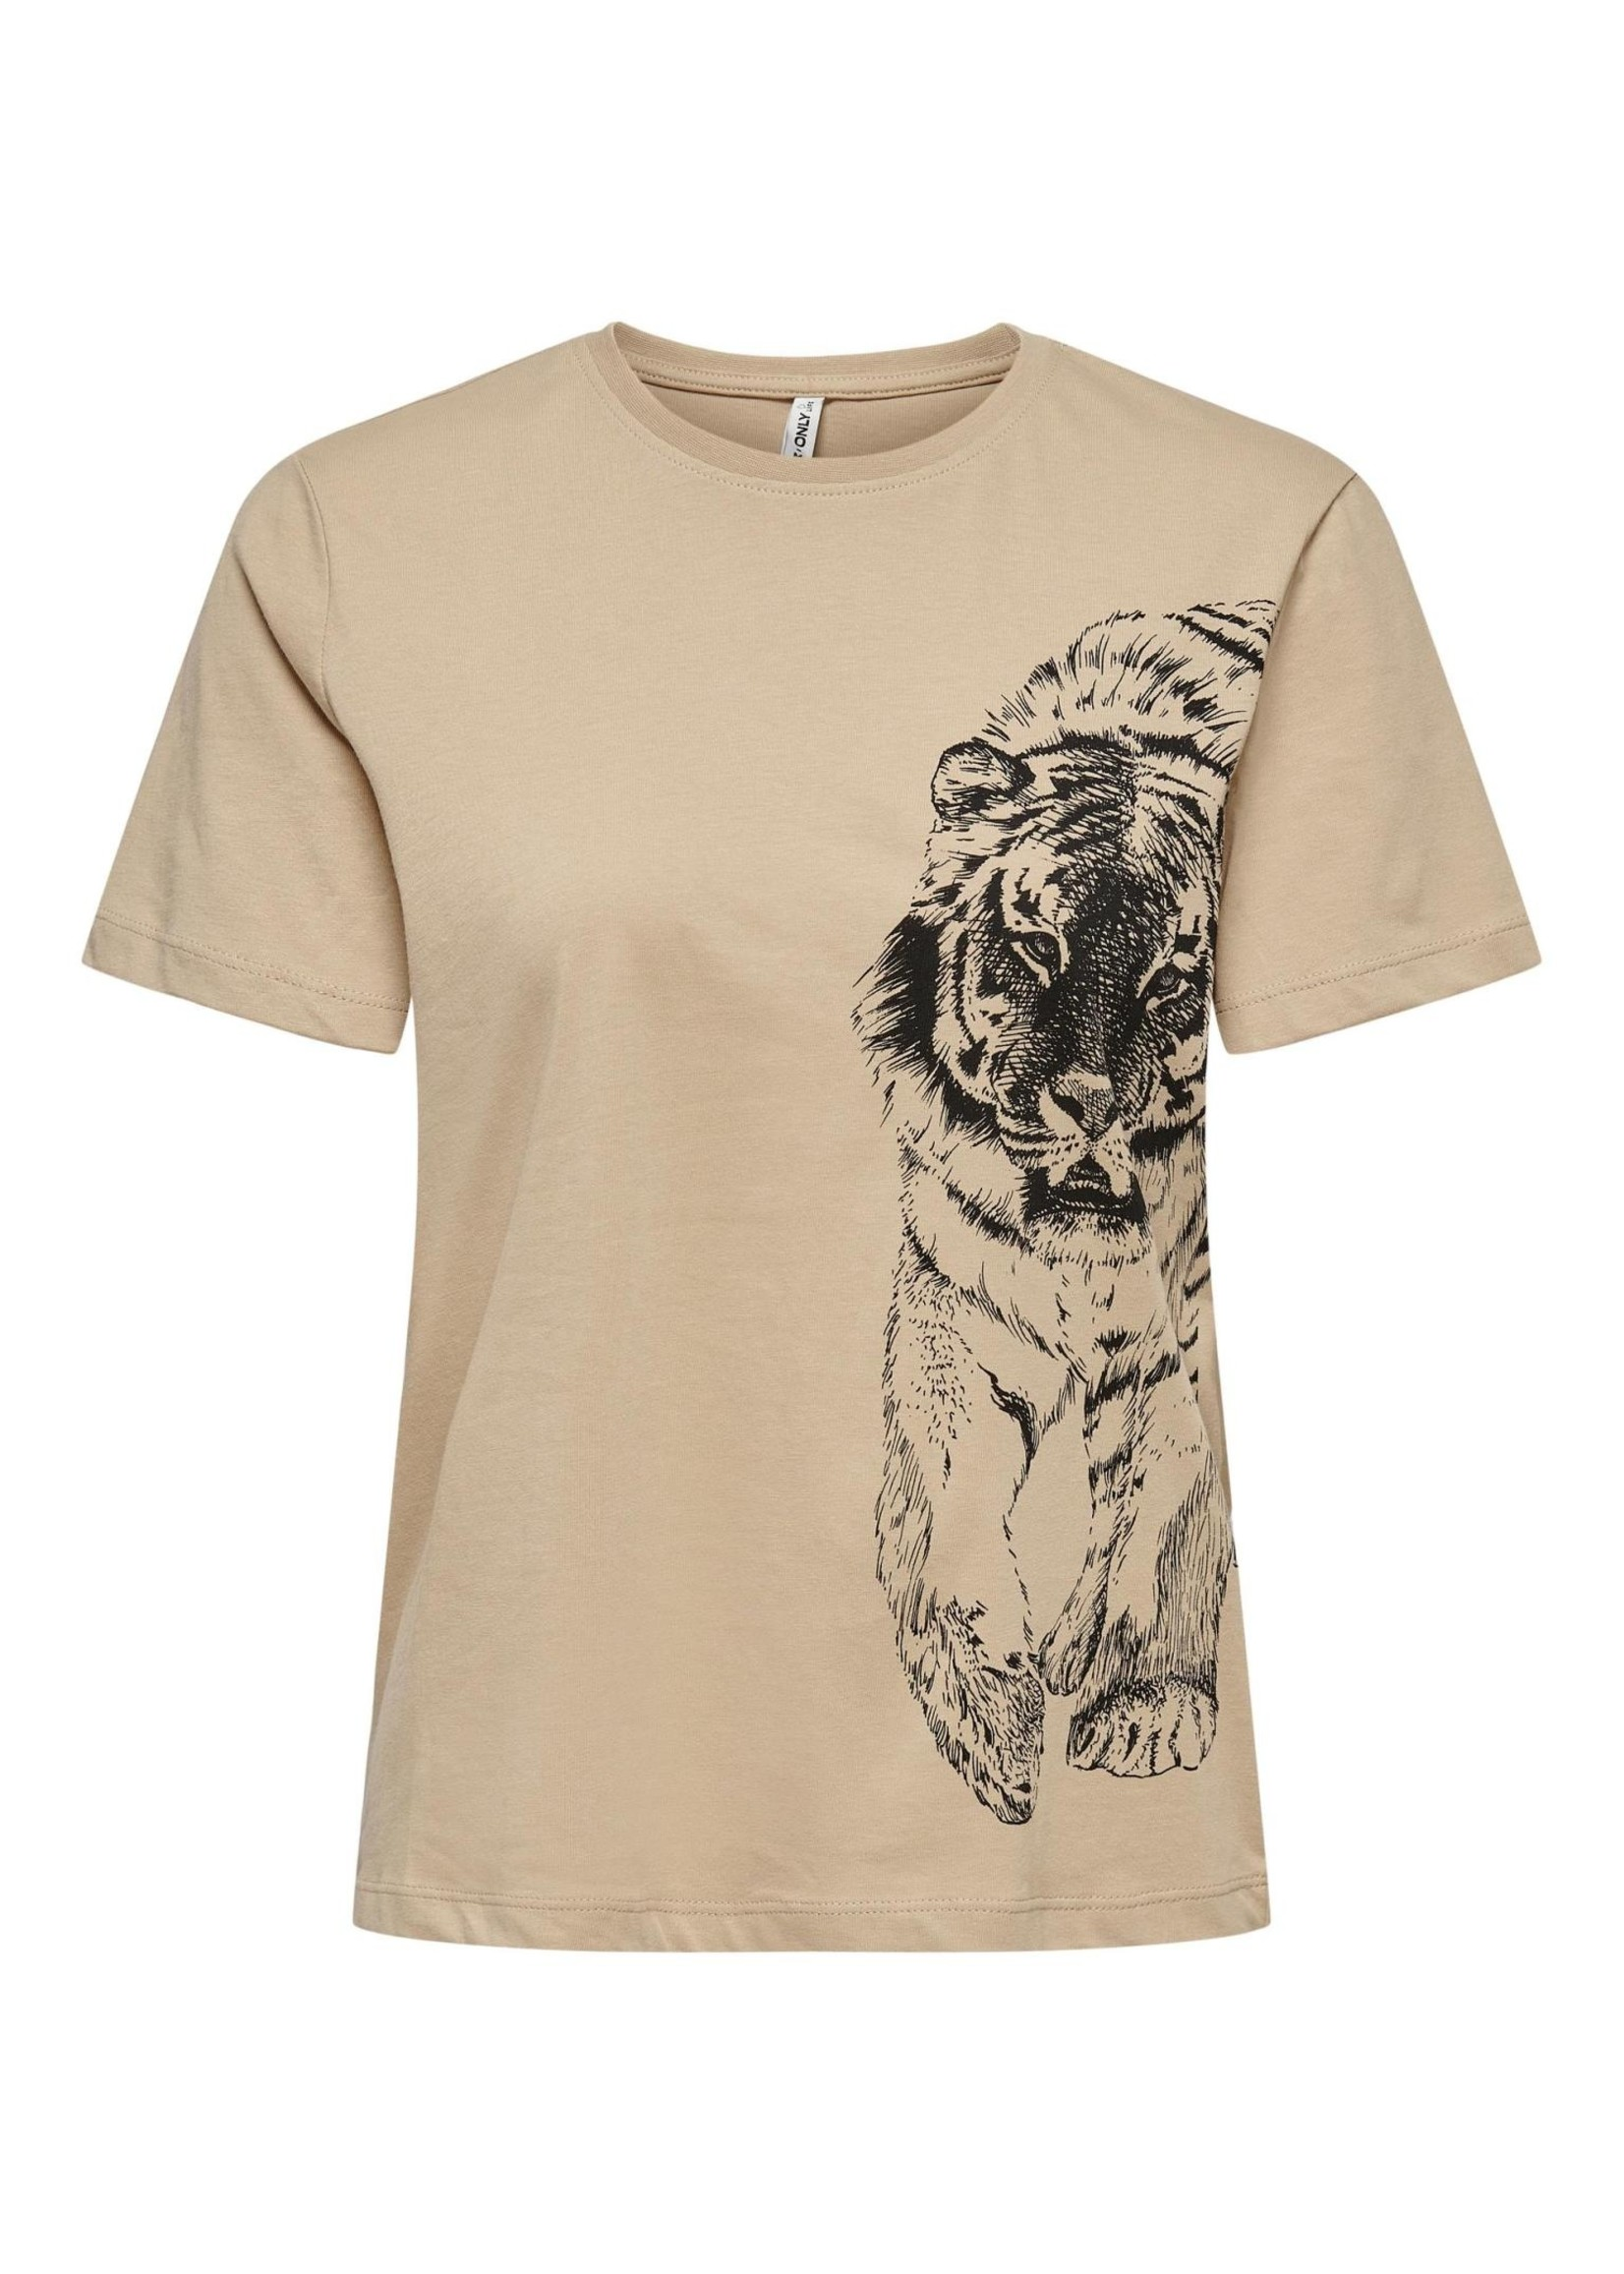 ONLY CATS LIFE REG S/S TOP BOX CS JRS humus tiger